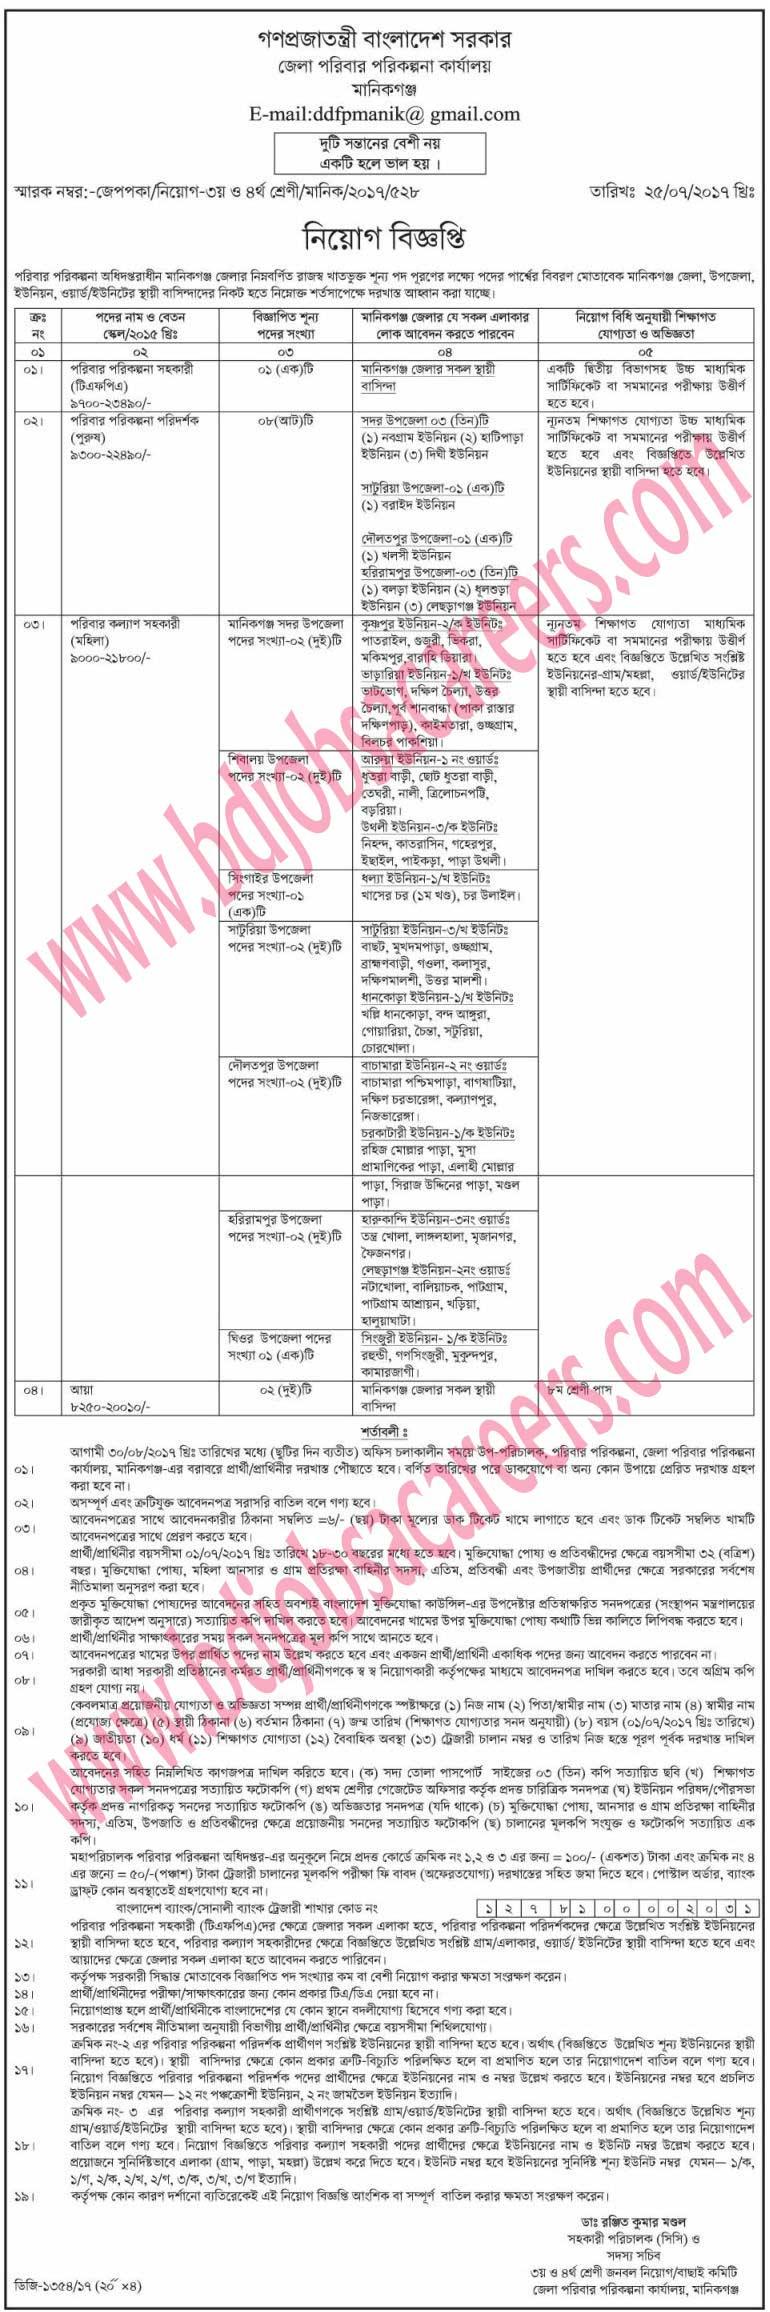 Manikganj District Family Planning Office Job Circular 2017